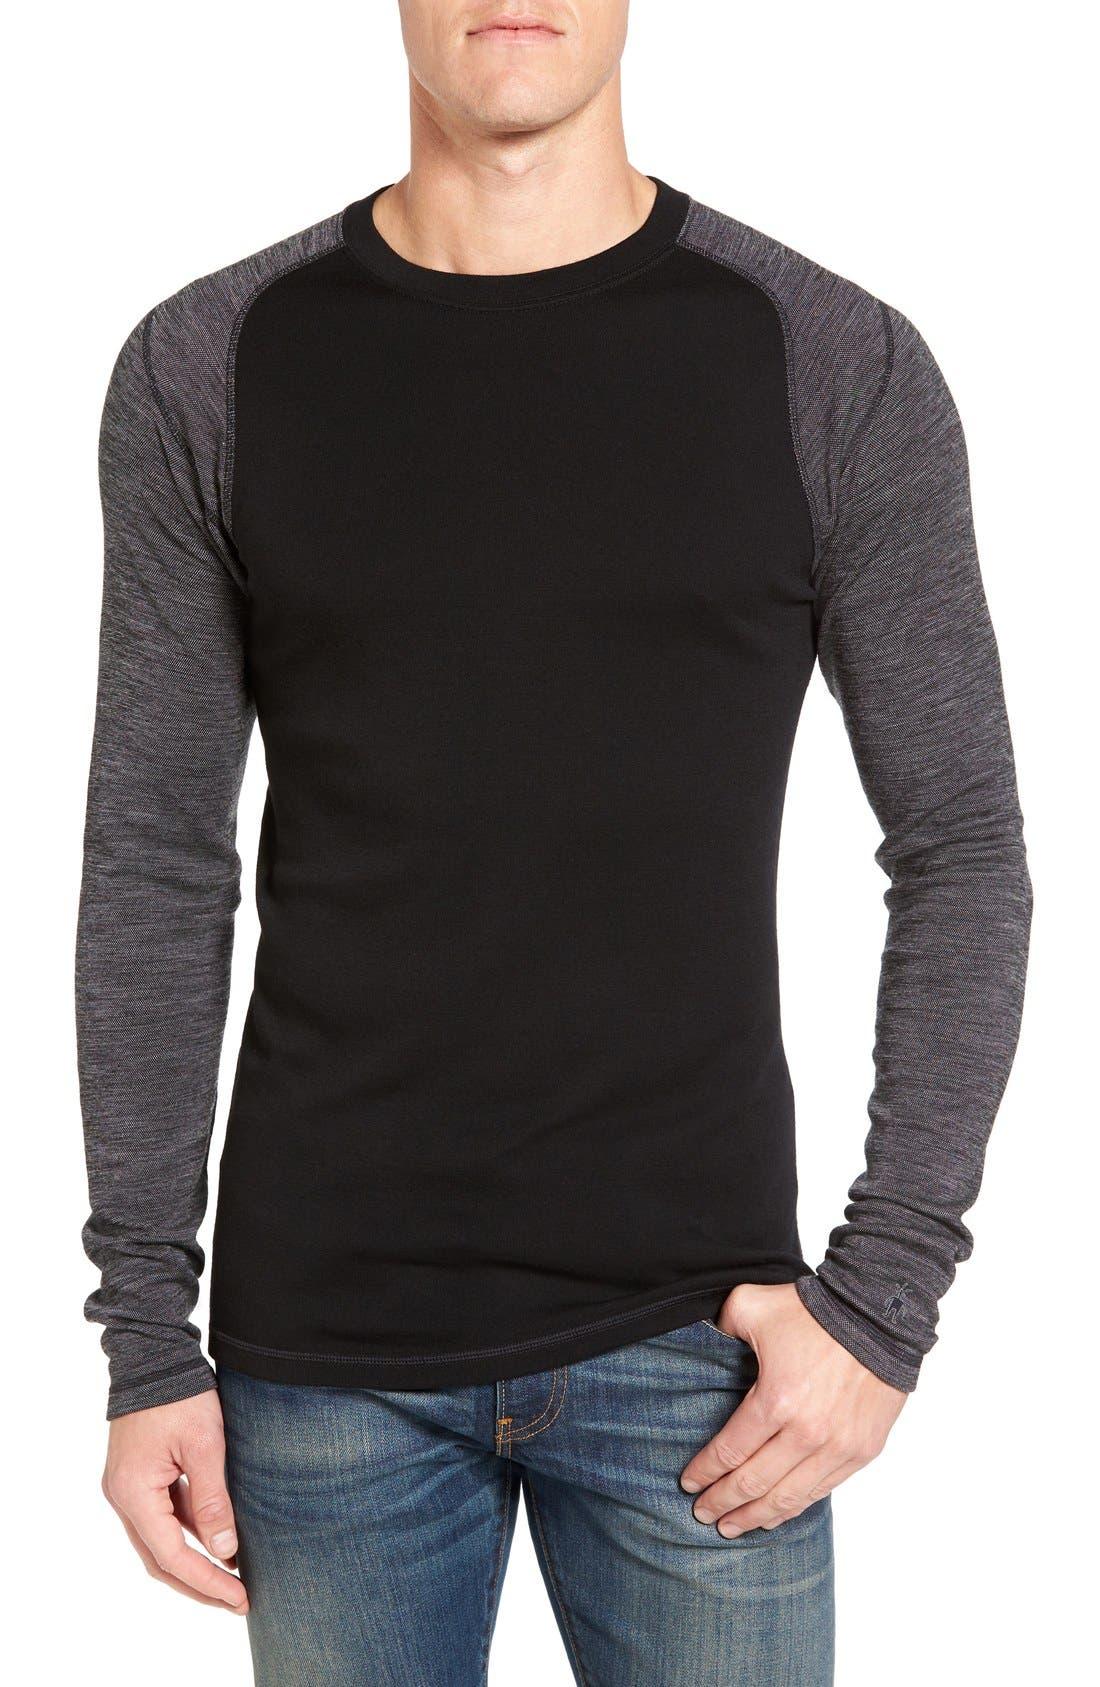 Merino 250 Base Layer Pattern Crewneck T-Shirt,                             Main thumbnail 1, color,                             Black/ Light Gray